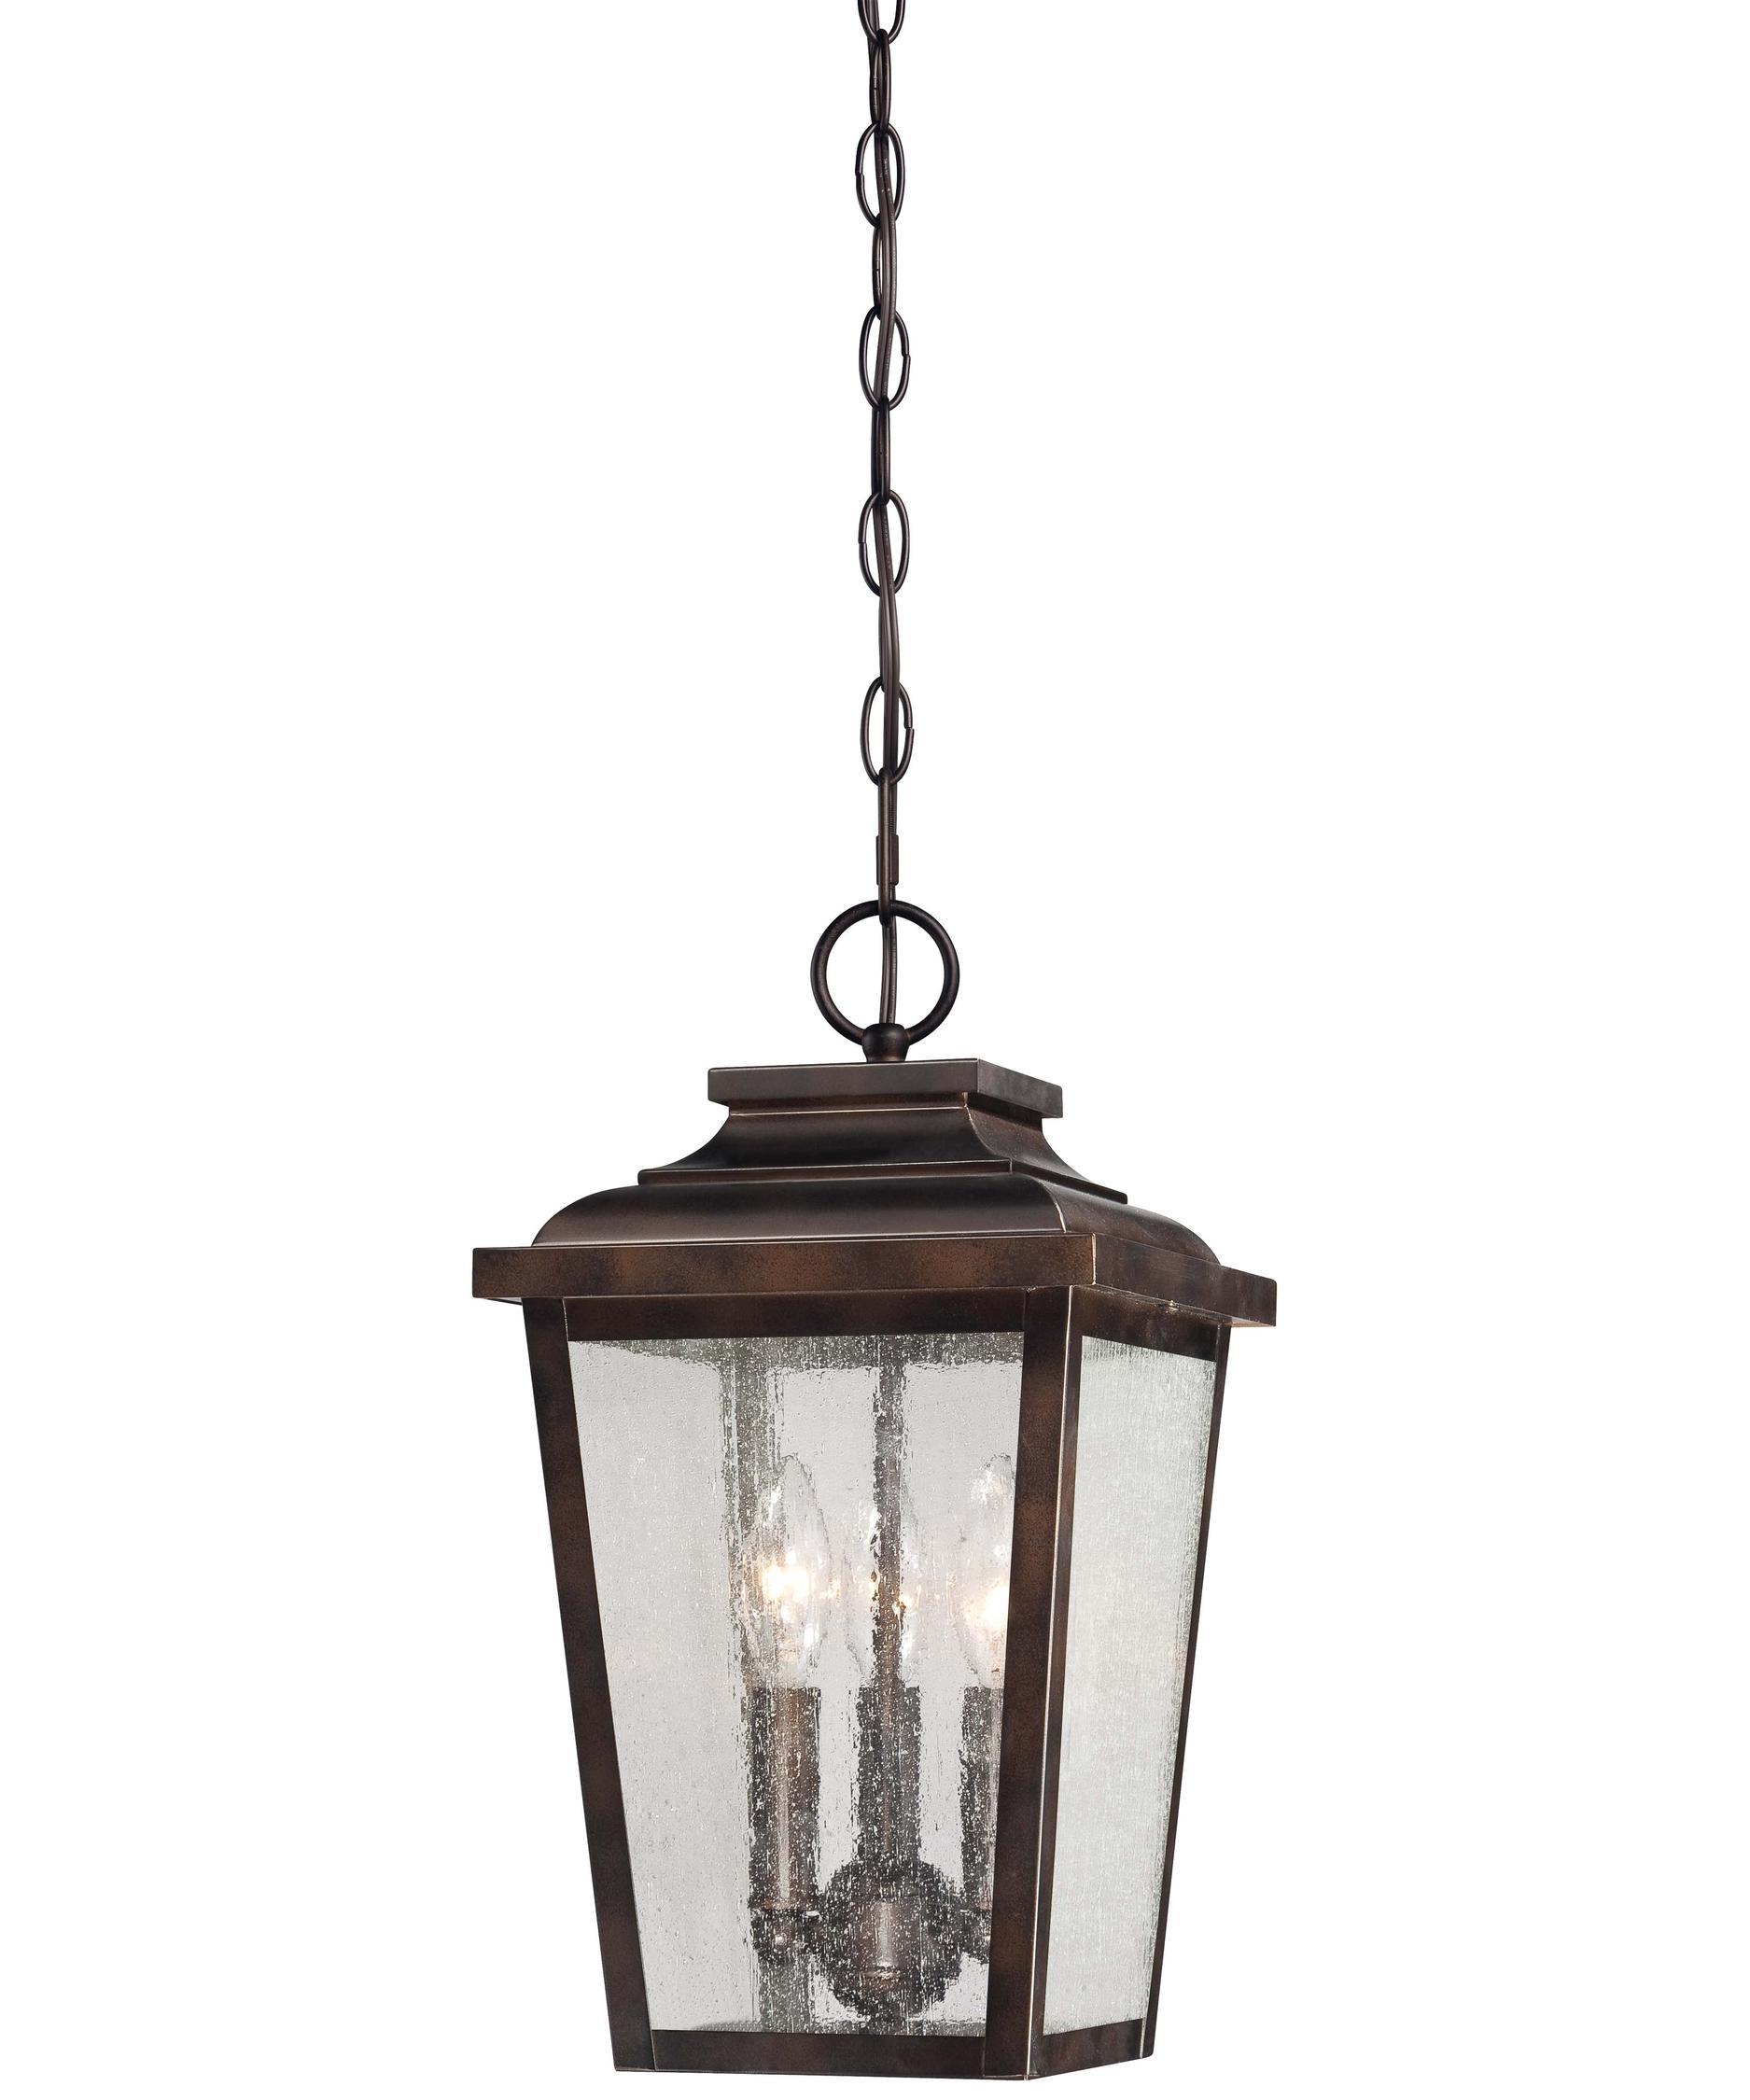 Hanging Outdoor Lights Pendant Lighting At Lumens Com Within With Outdoor Hanging Bar Lights (#5 of 15)